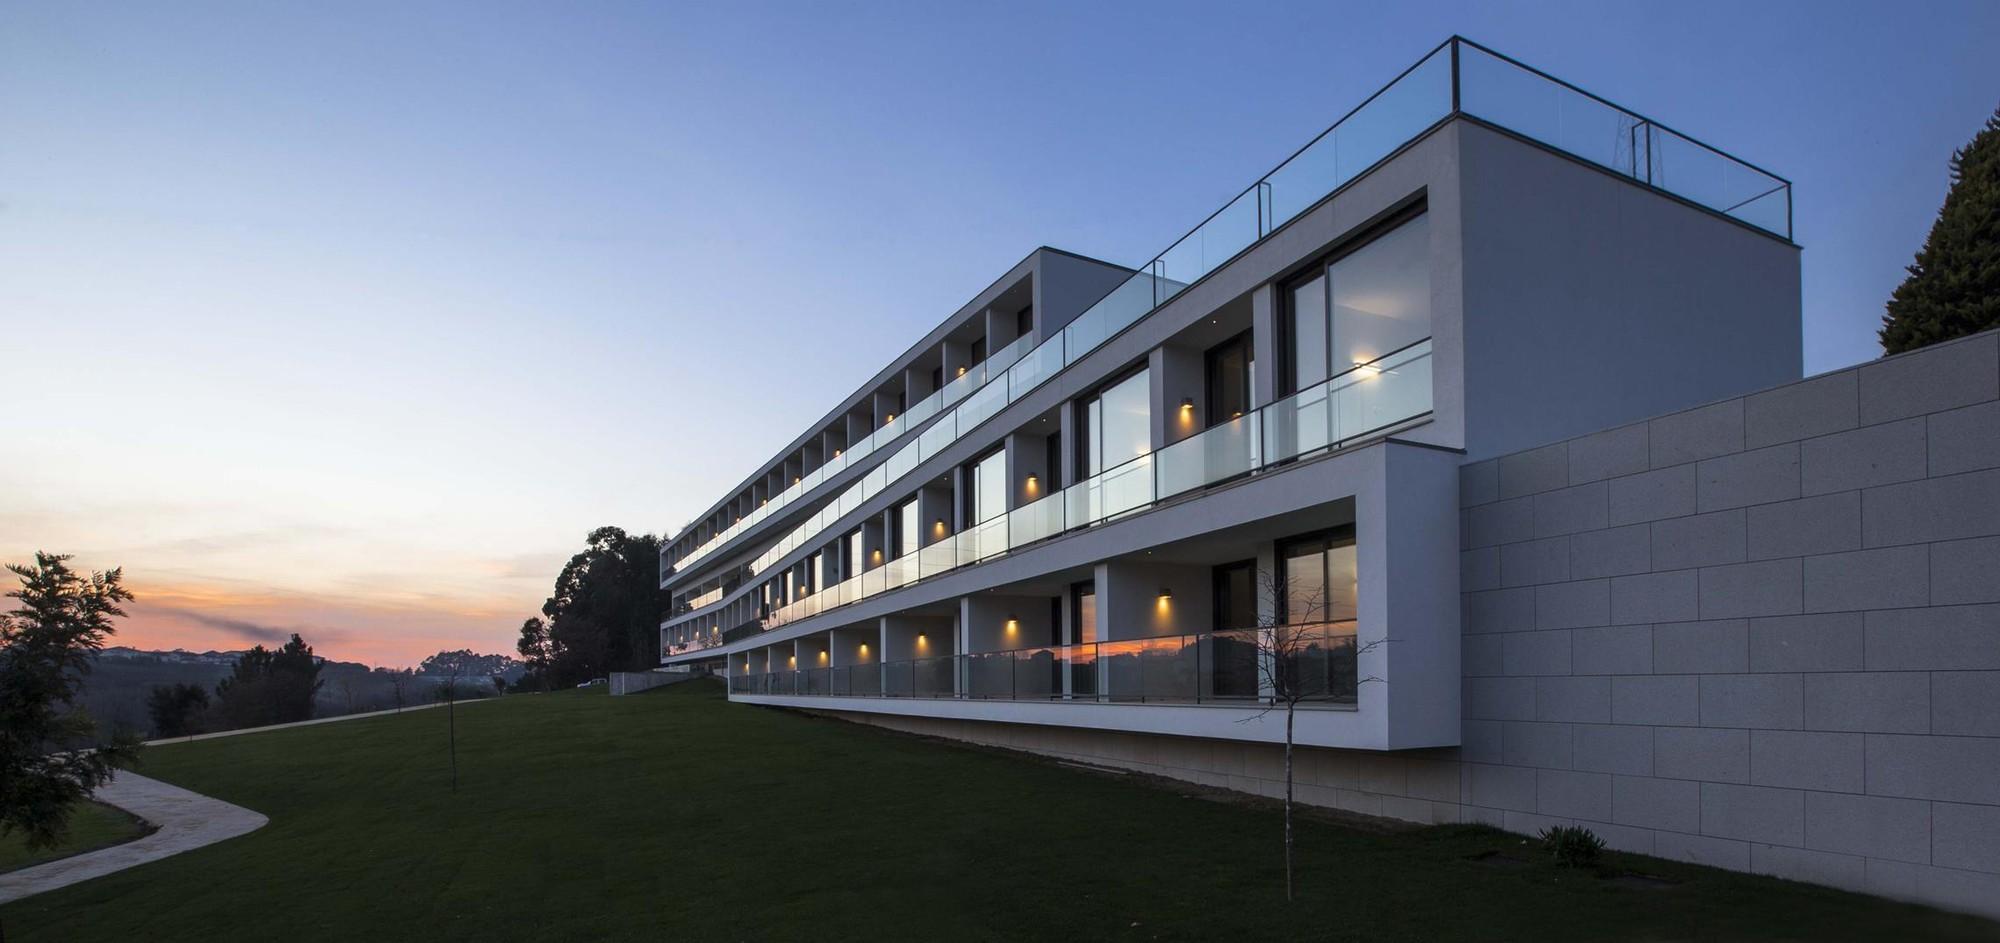 Lar Residencial Torre Sénior / Atelier d'Arquitectura J. A. Lopes da Costa, © Manuel Aguiar